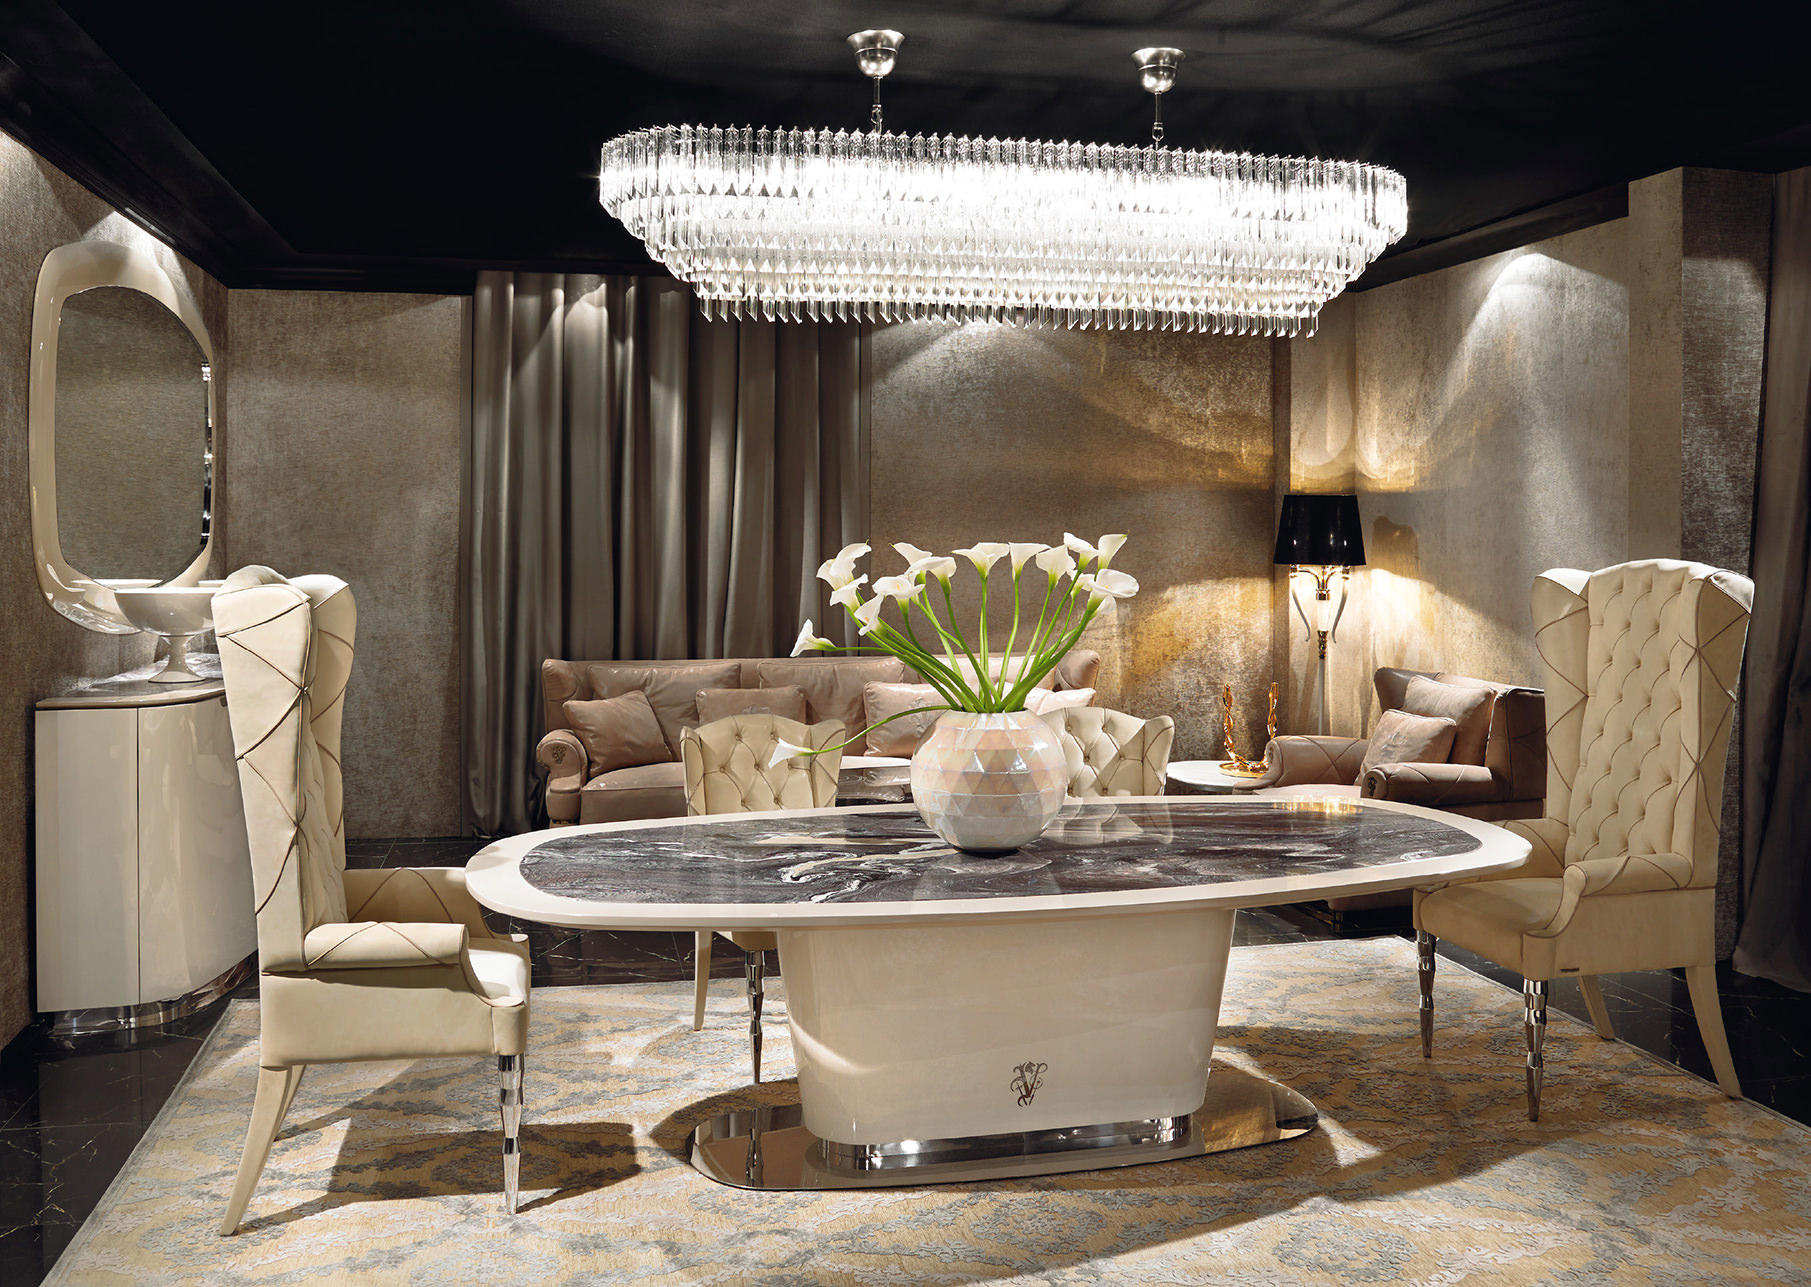 Brunswick Dining Room Visionnaire Home Philosophy #4F6110 1811 1287 Sala Da Pranzo Mercatone Uno